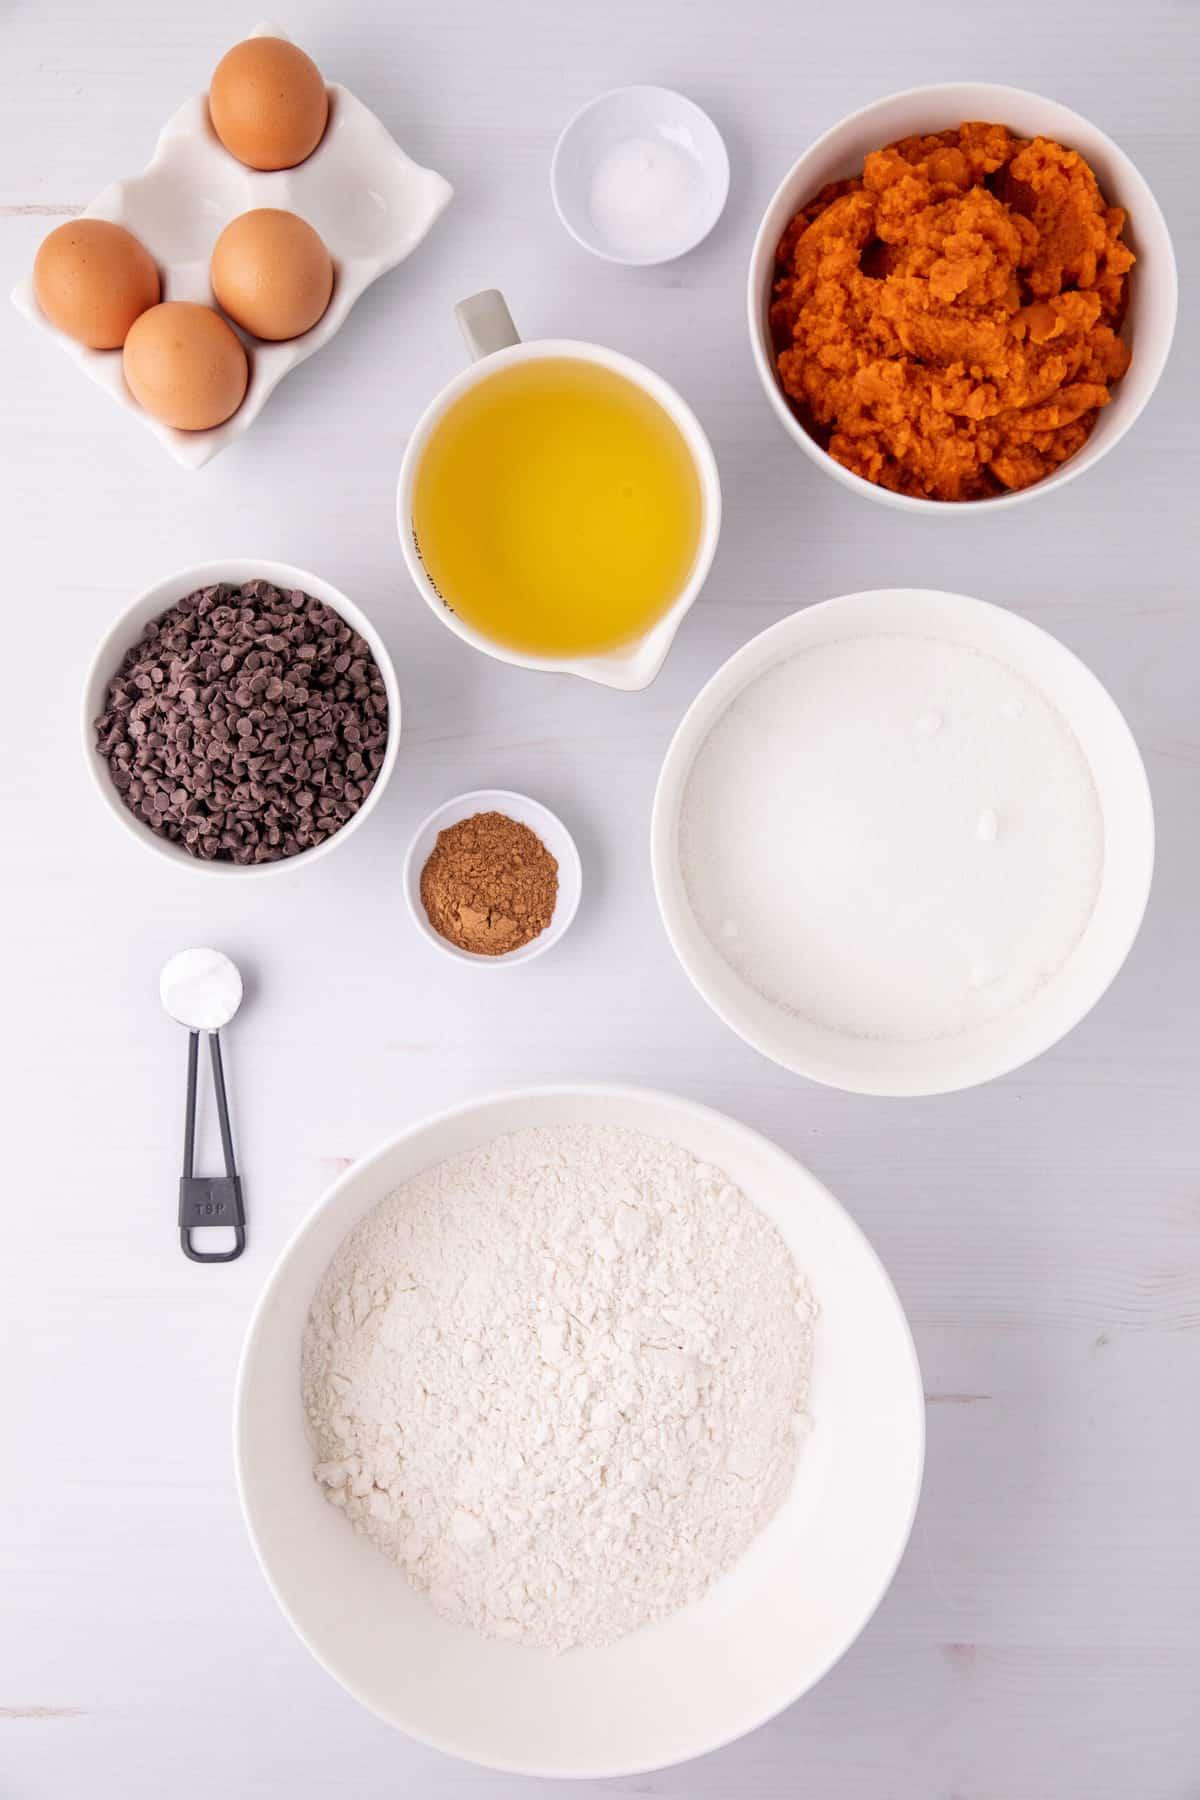 ingredients to make chocolate chip pumpkin bread